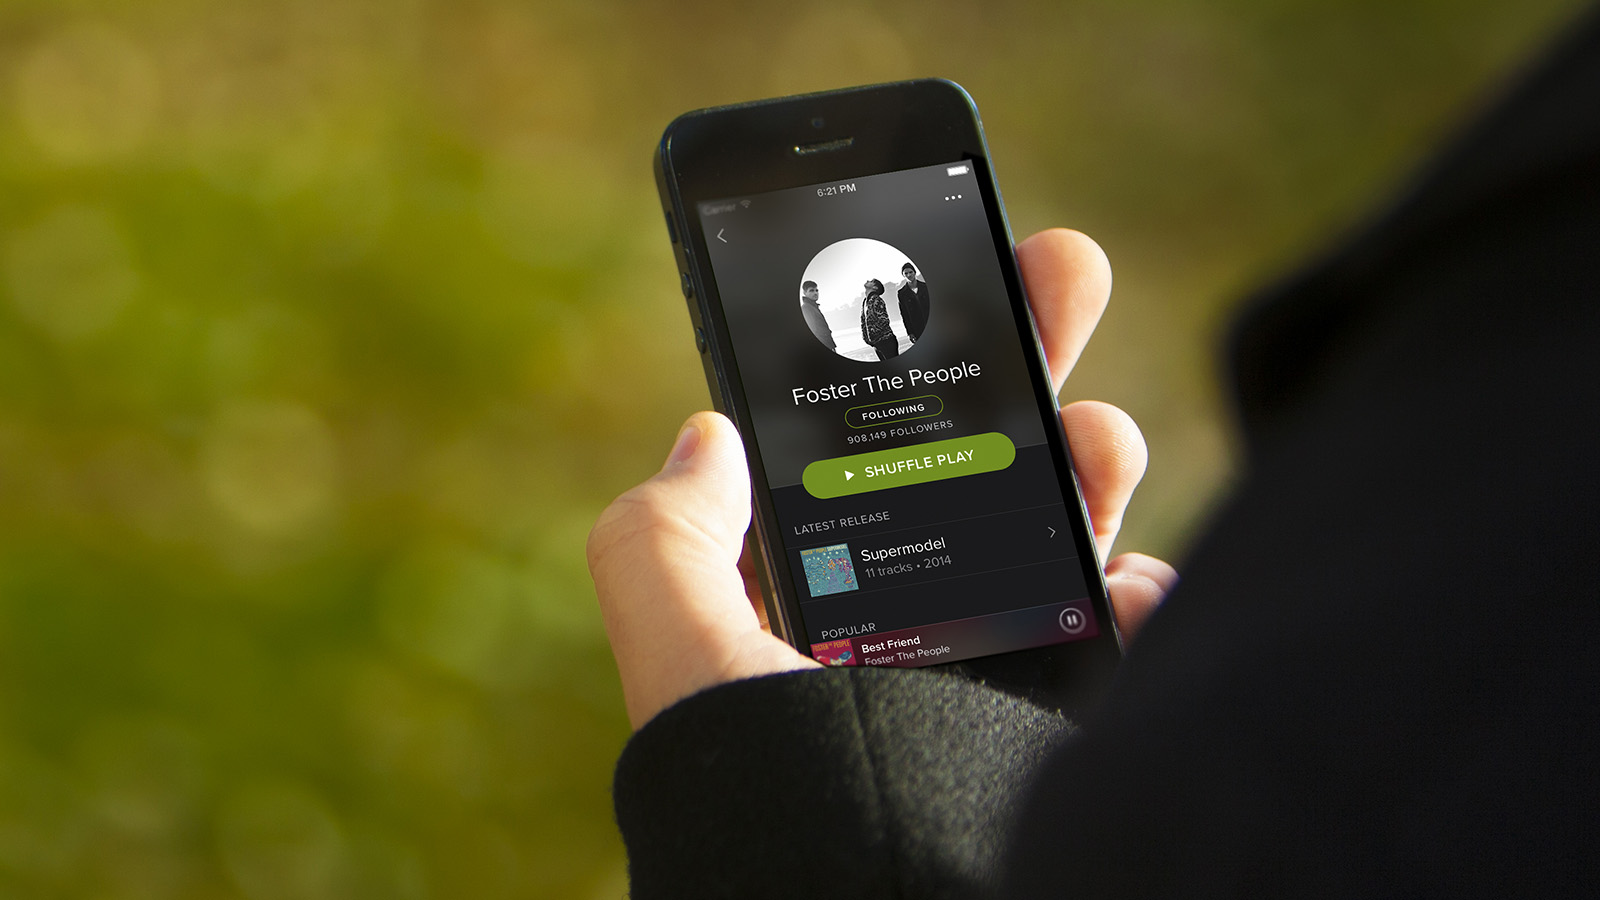 descargar musica de spotify en iphone gratis